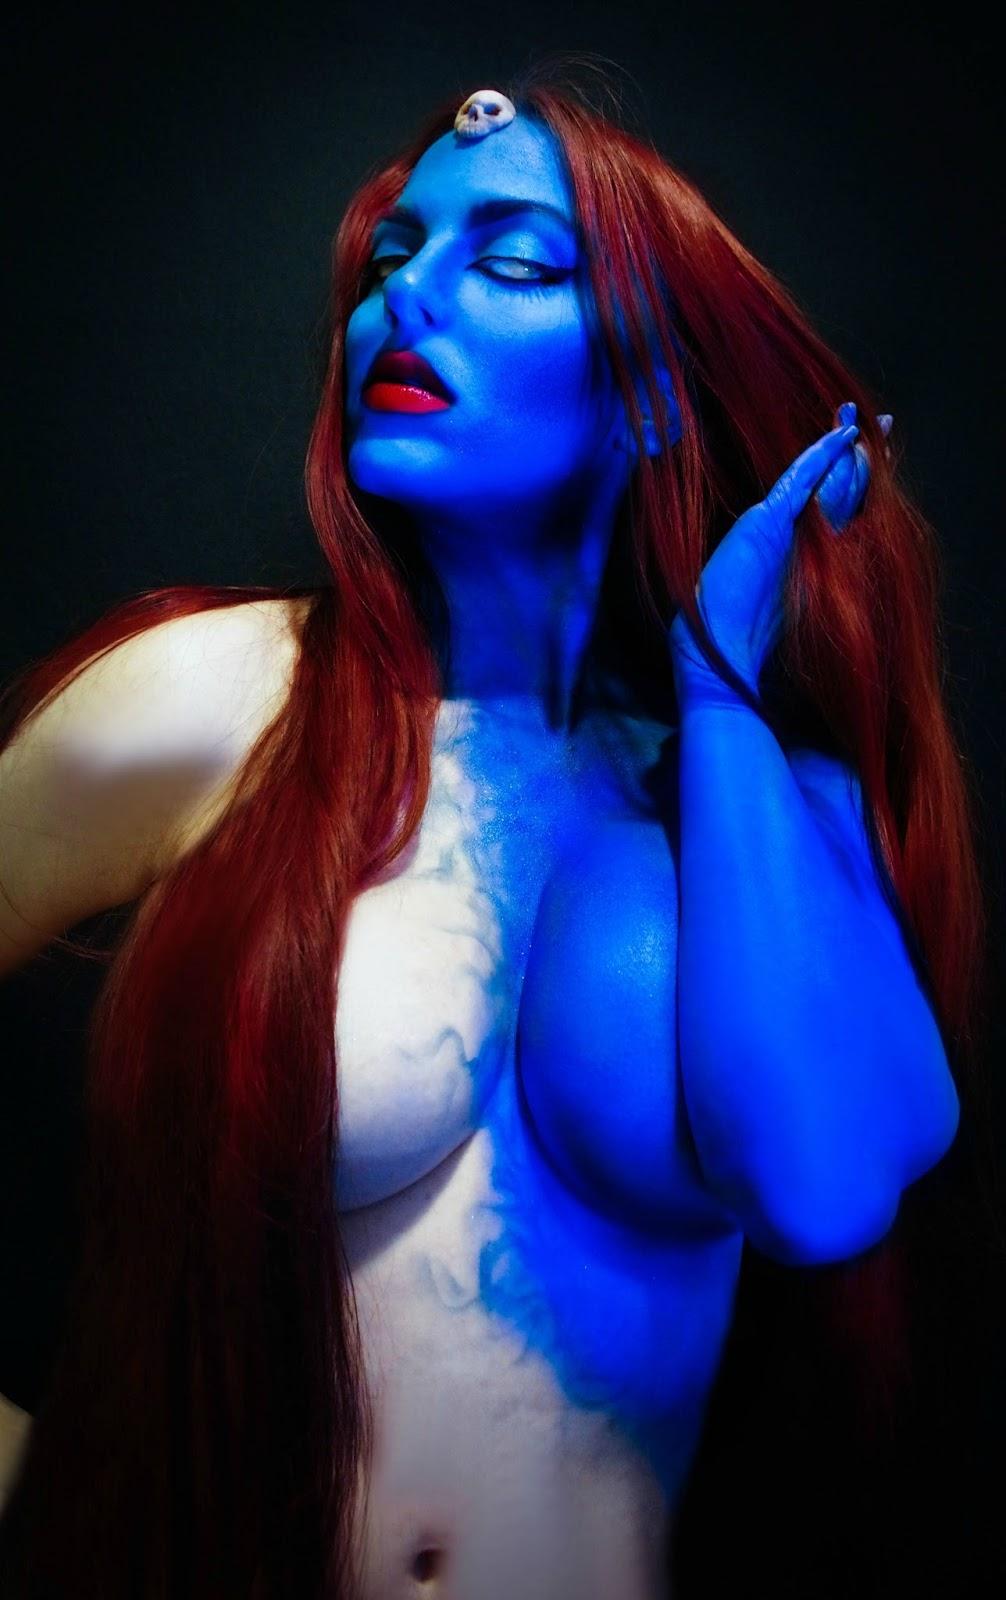 mystique sexy